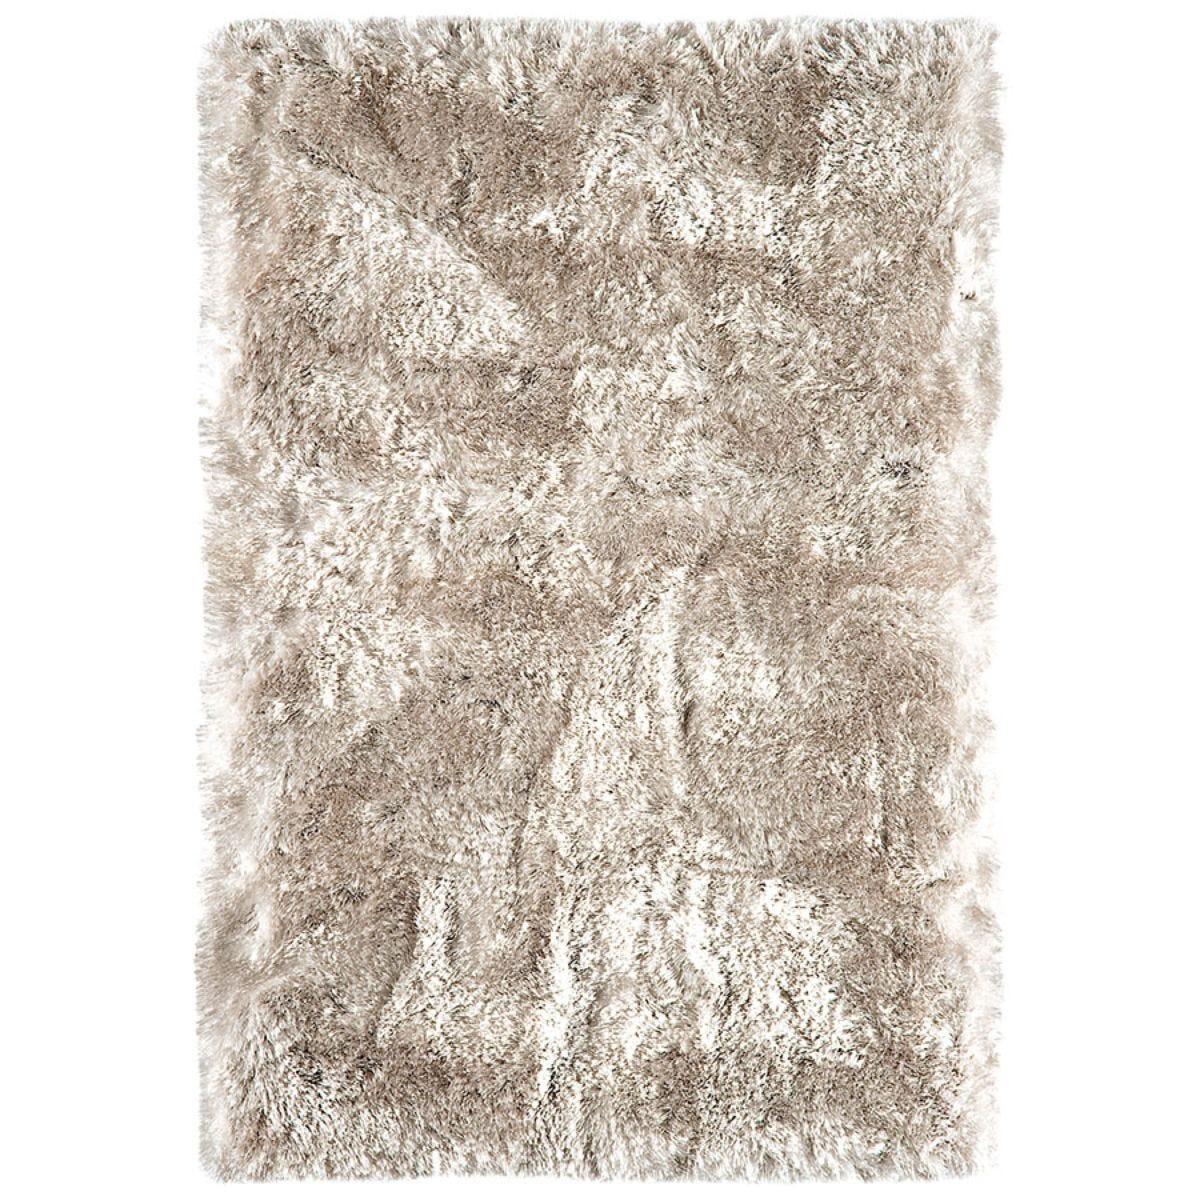 Asiatic Plush Shaggy Rug, 120 x 170cm - Sand